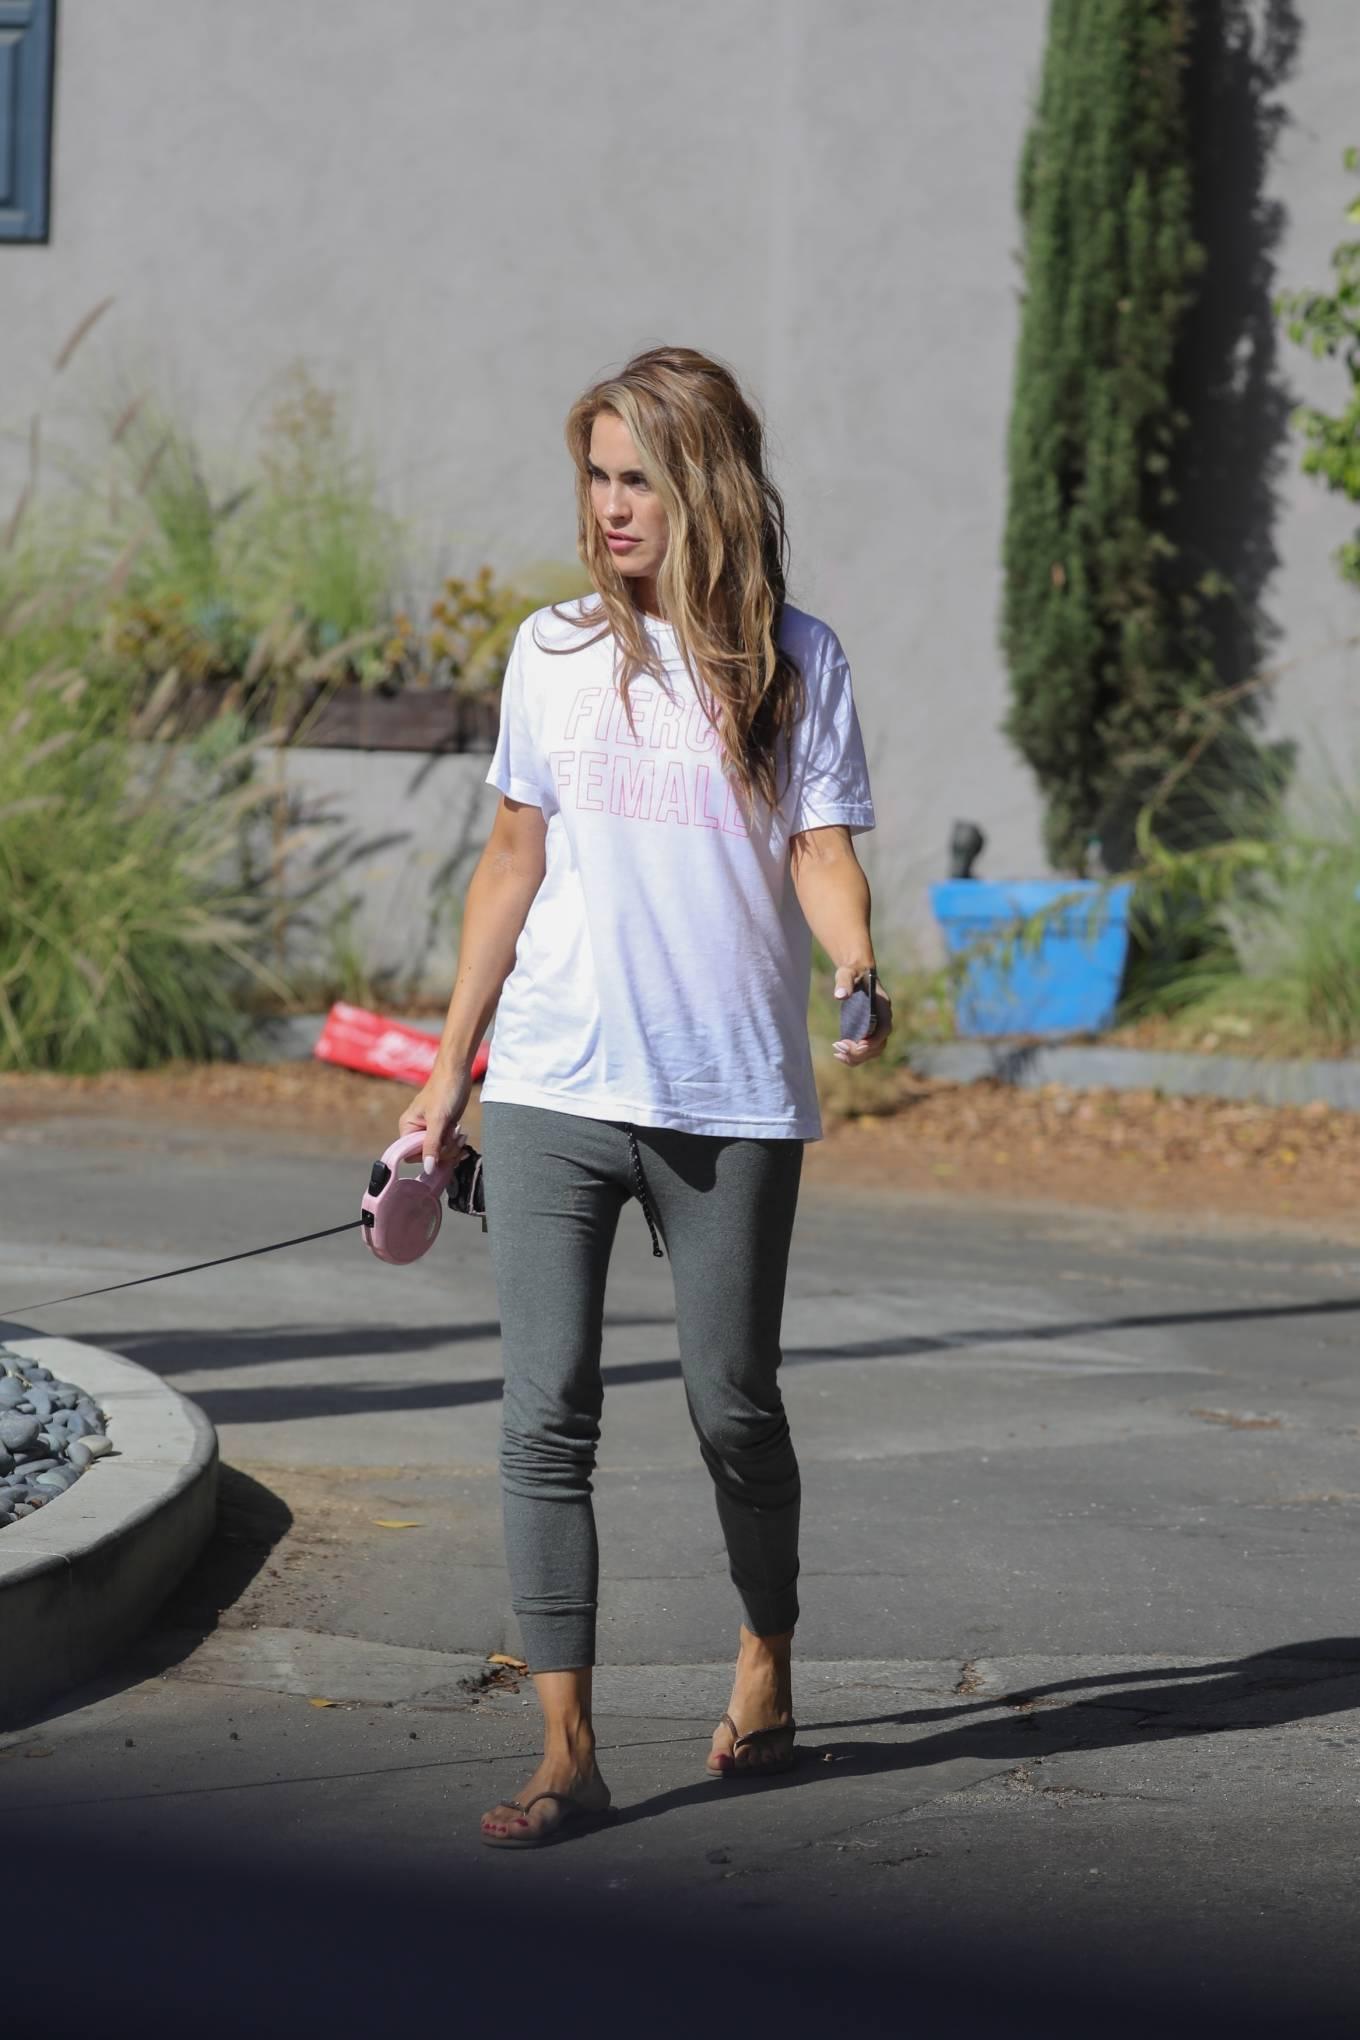 Chrishell Stause 2020 : Chrishell Stause – Seen walking her dog in Los Angeles-06